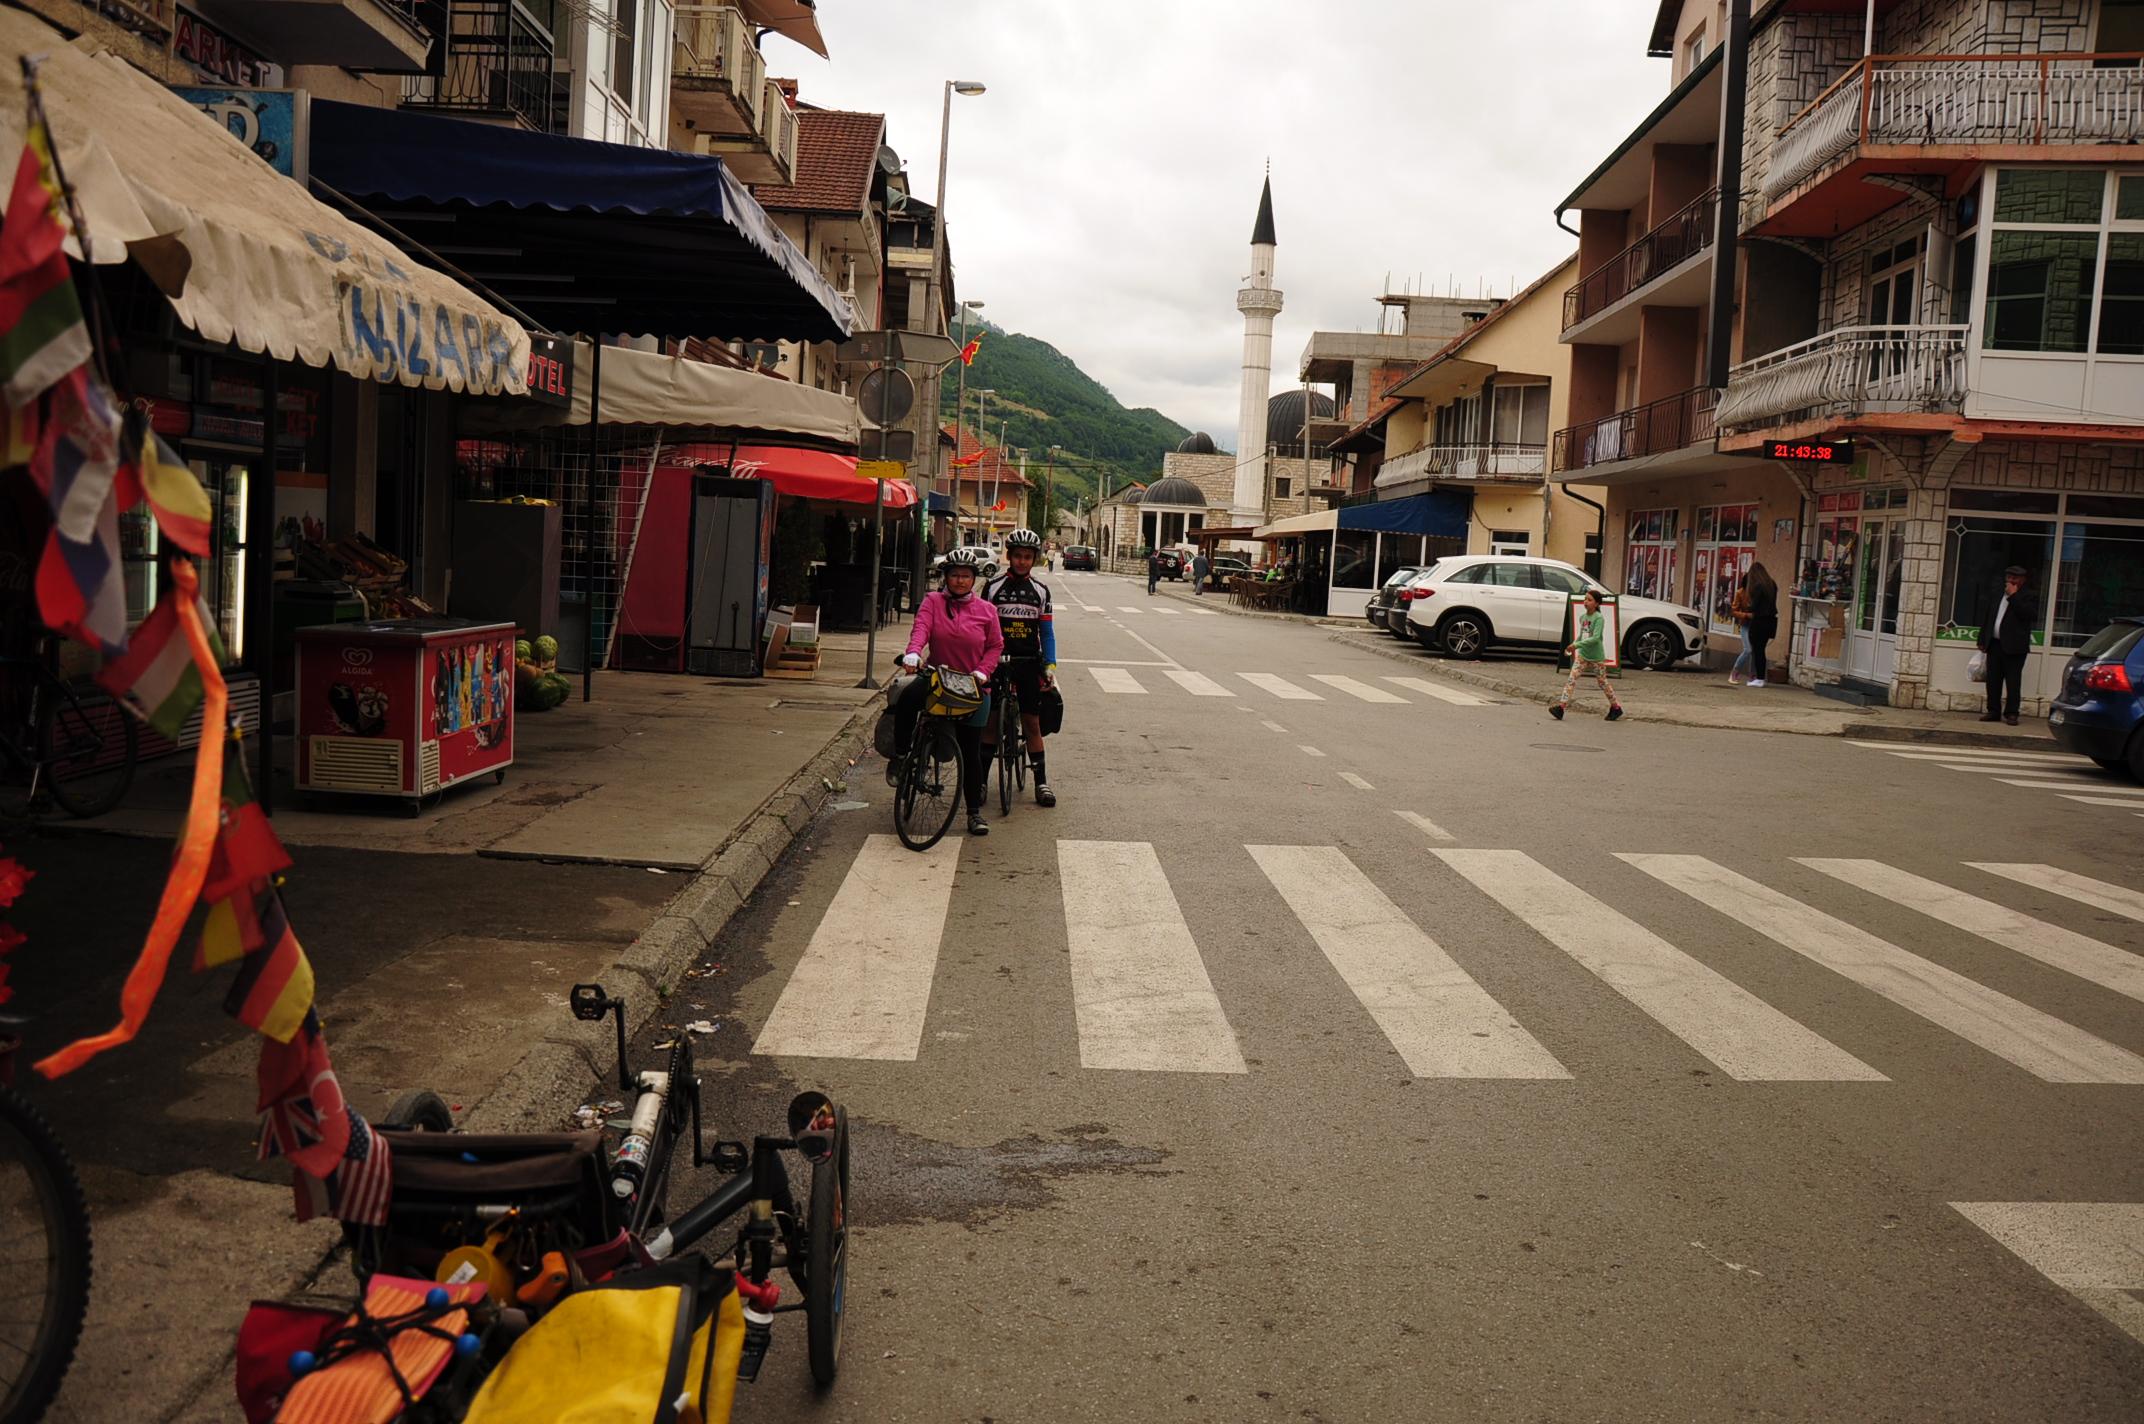 The main street in Gusinje